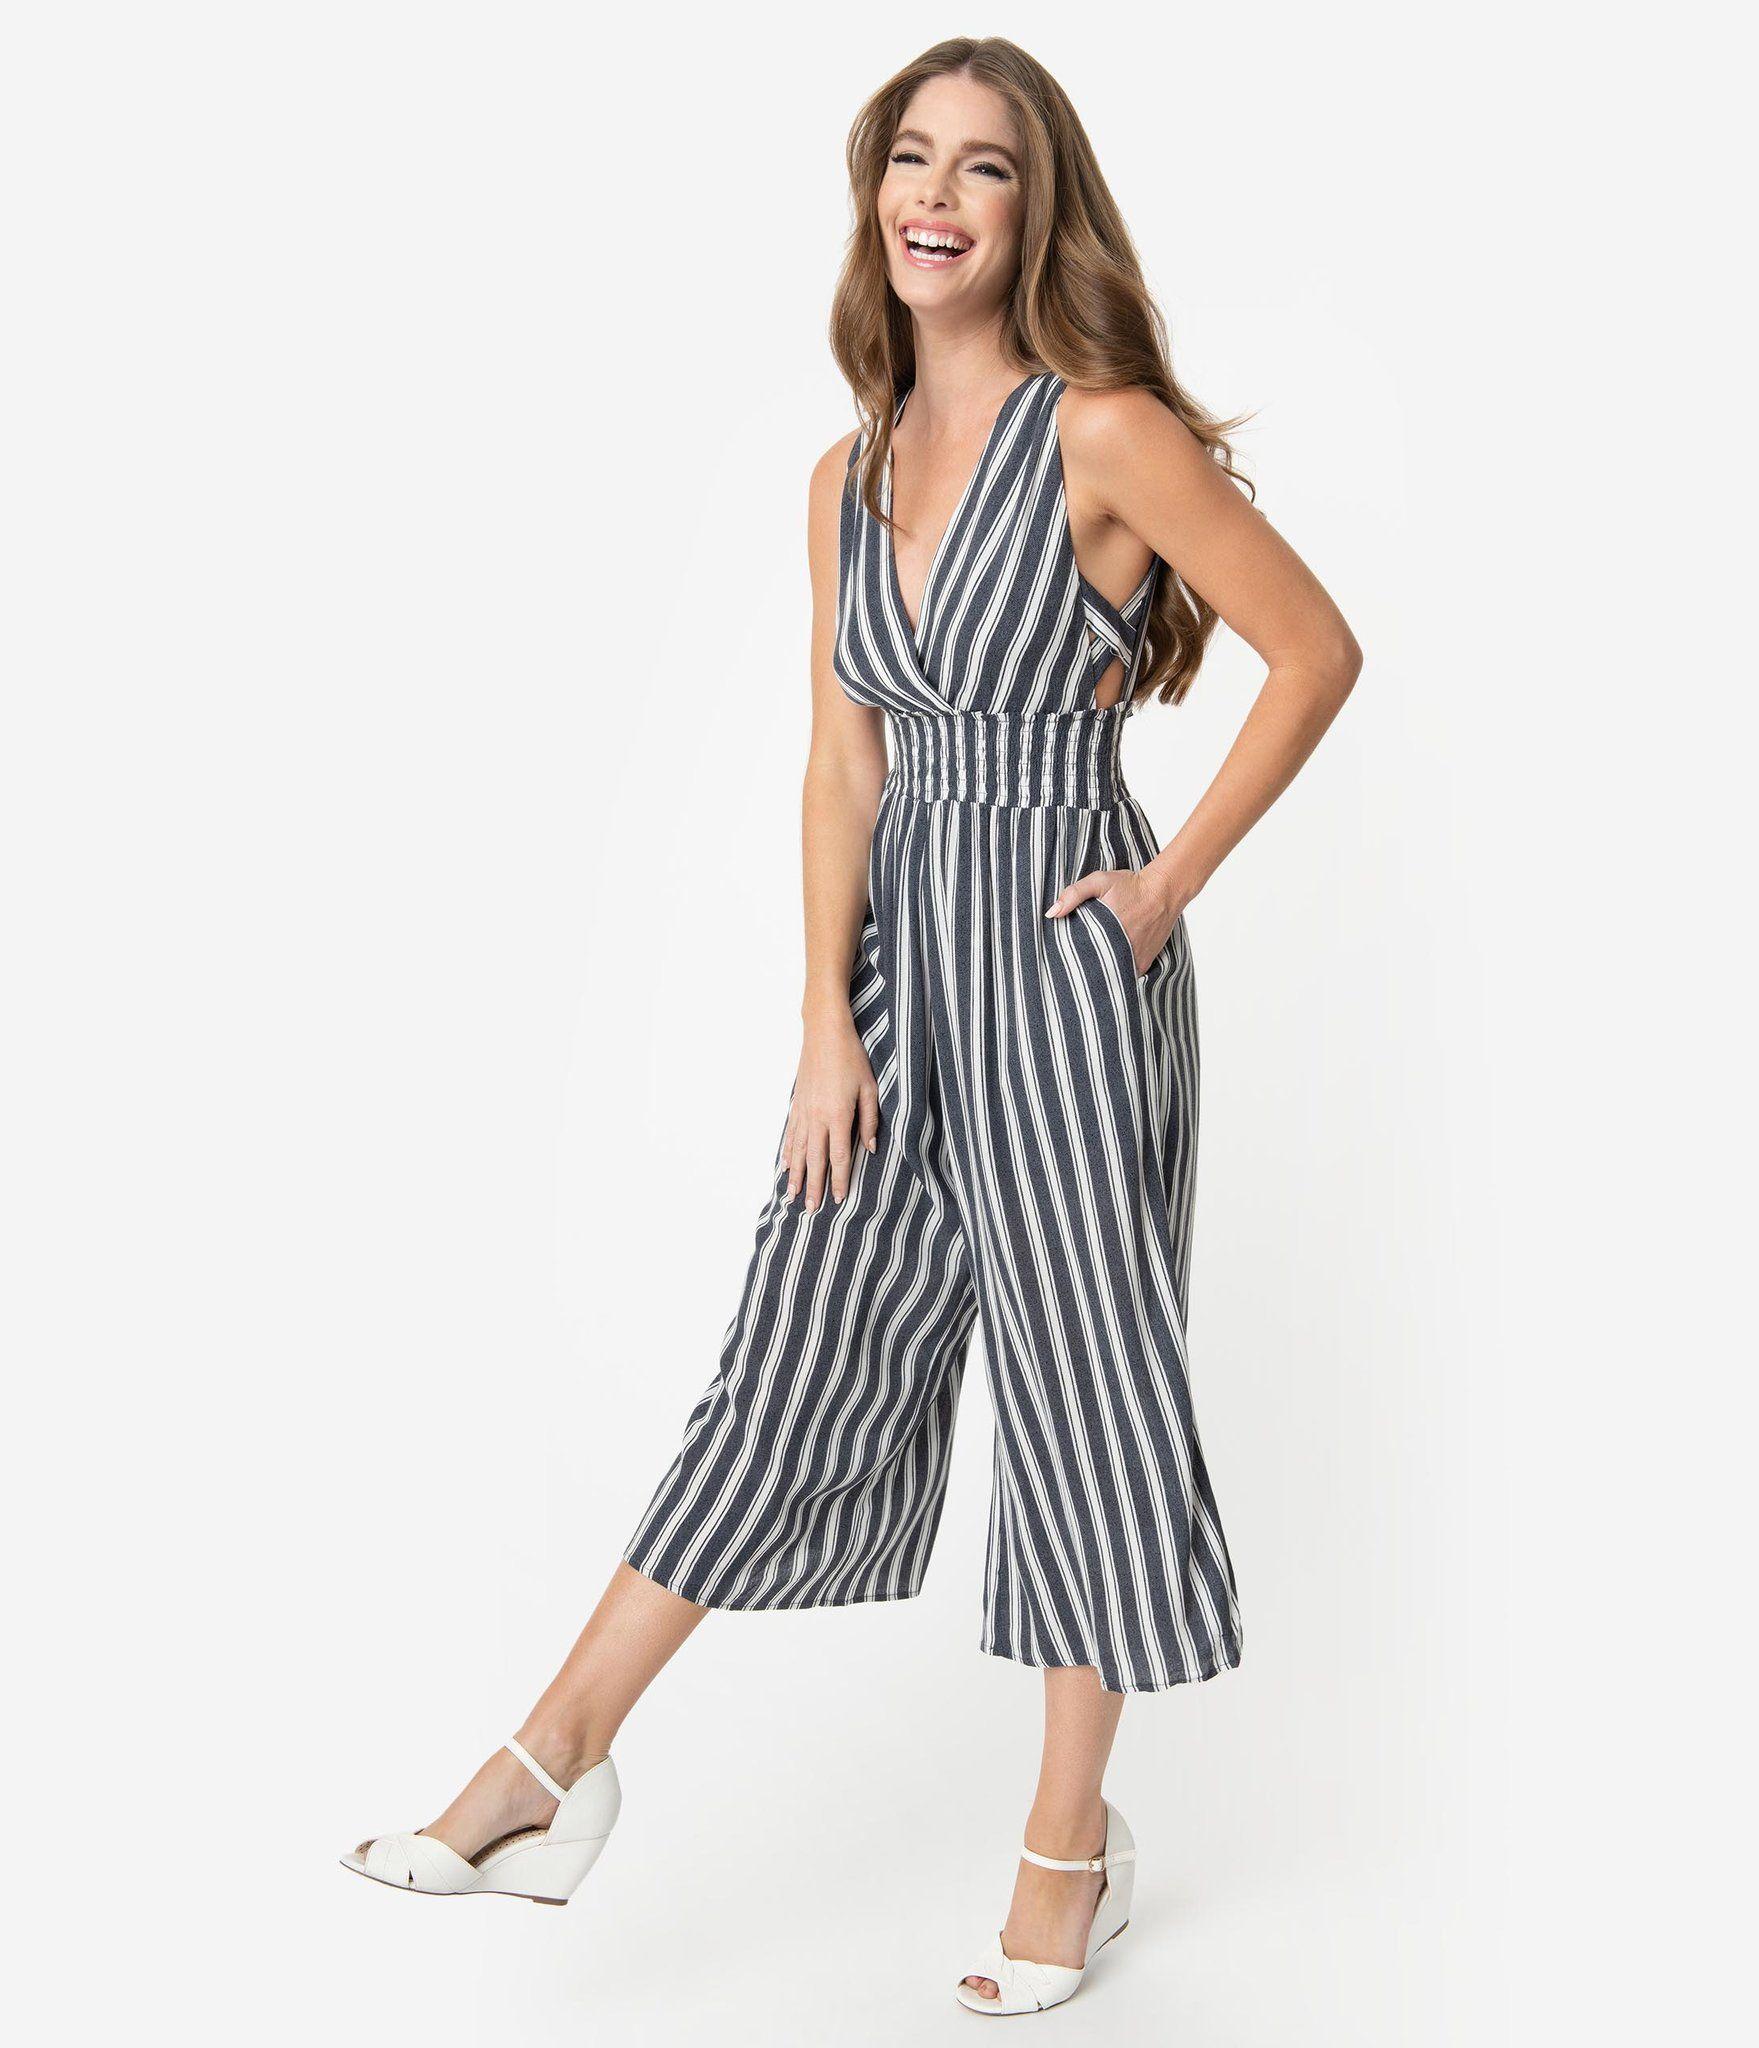 625fdef77ed4 Grey & White Stripe Woven Sleeveless Culotte Jumpsuit – Unique Vintage